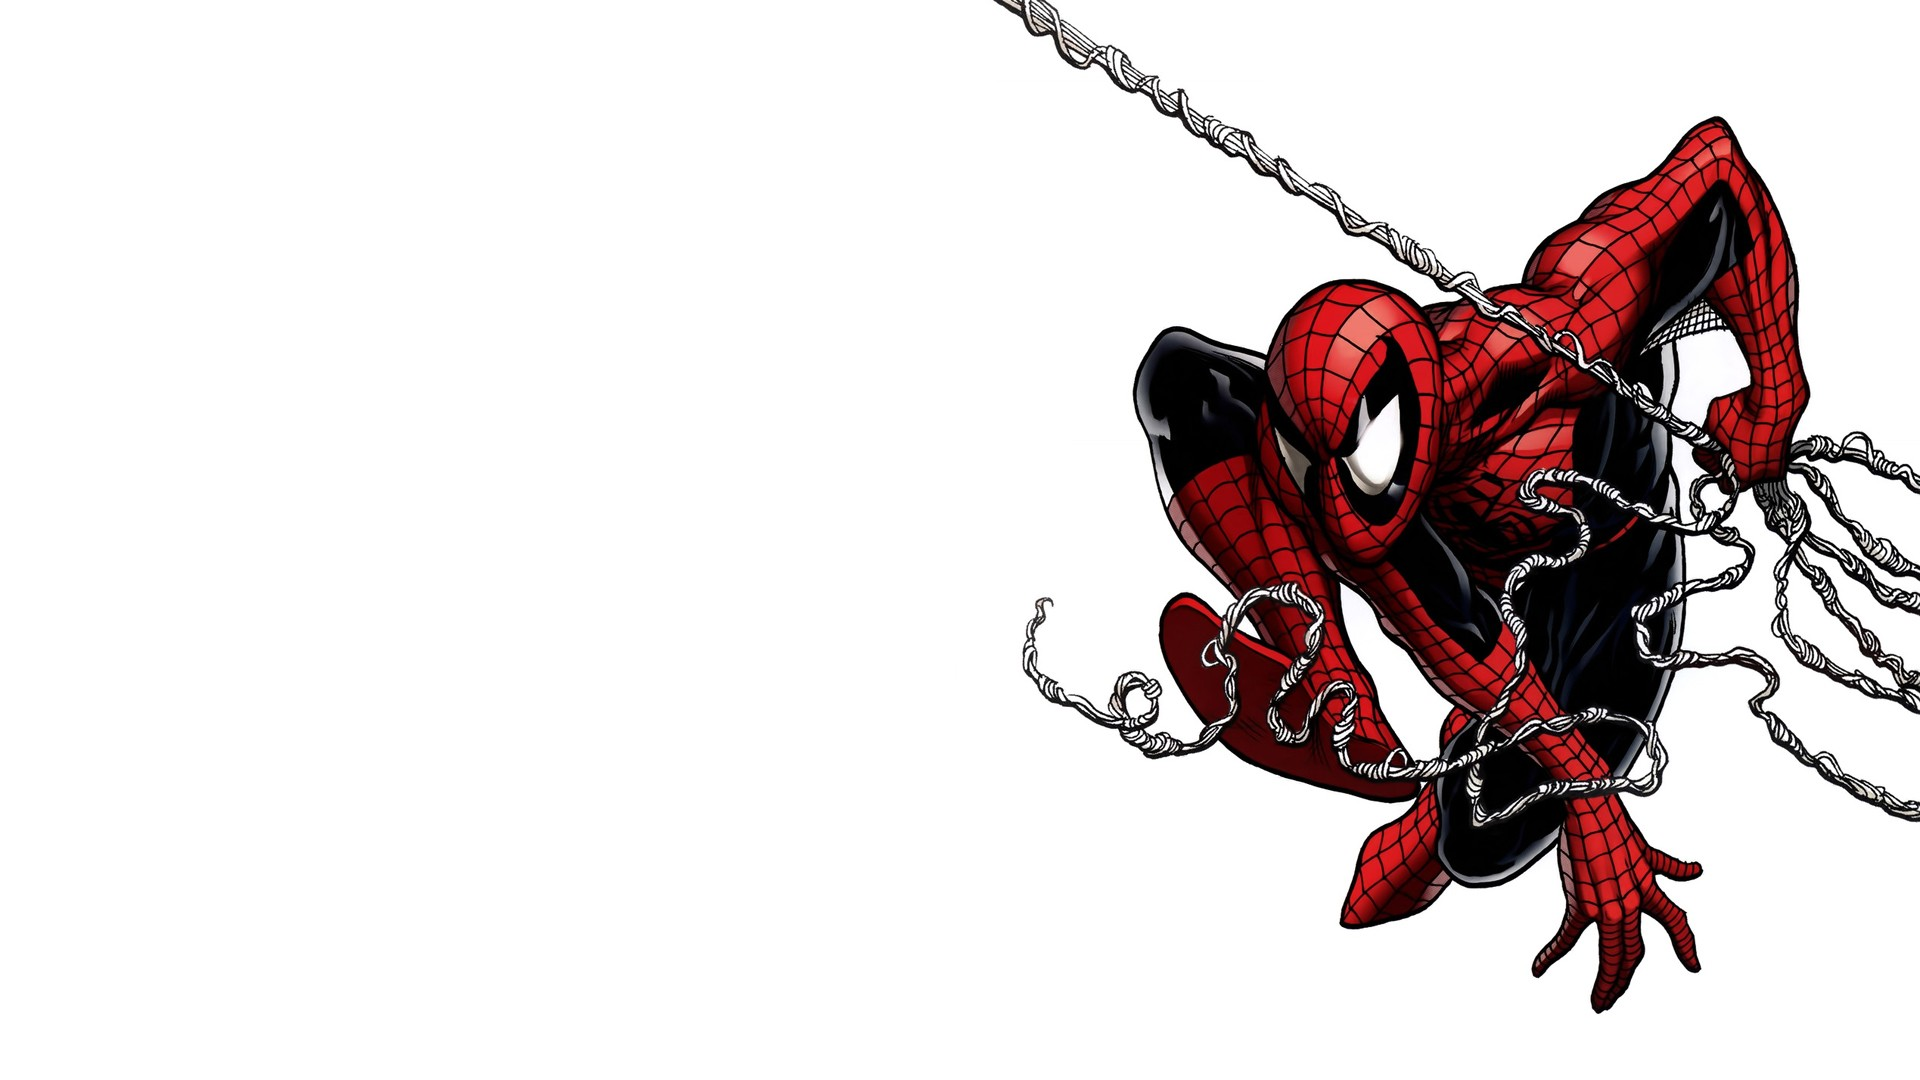 Comics Spider Man Marvel wallpaper 1920x1080 186059 WallpaperUP 1920x1080